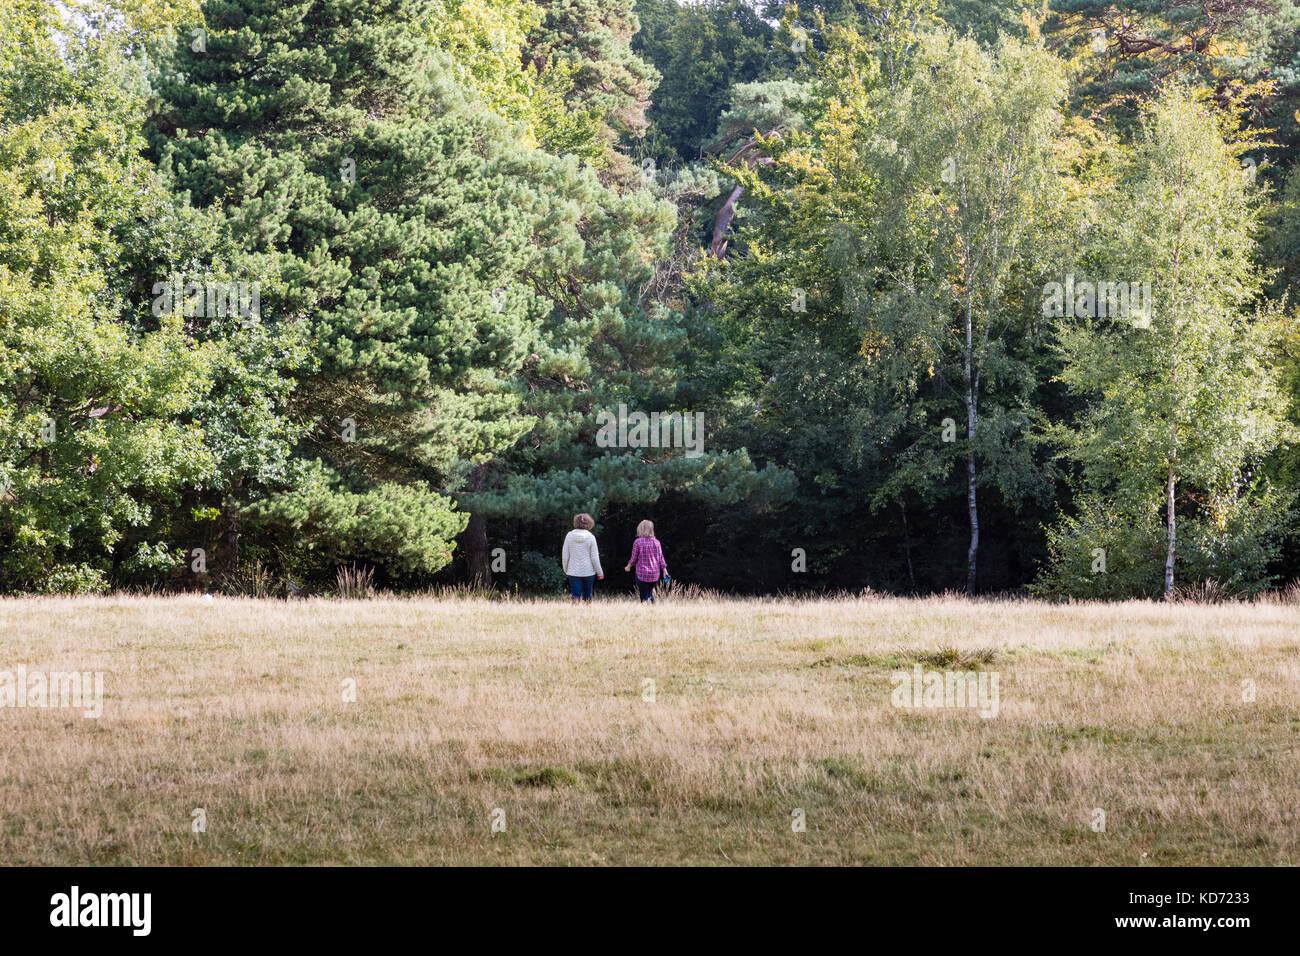 Two women dog walkers walk their dogs across Keston Common, Bromley, London, UK - Stock Image